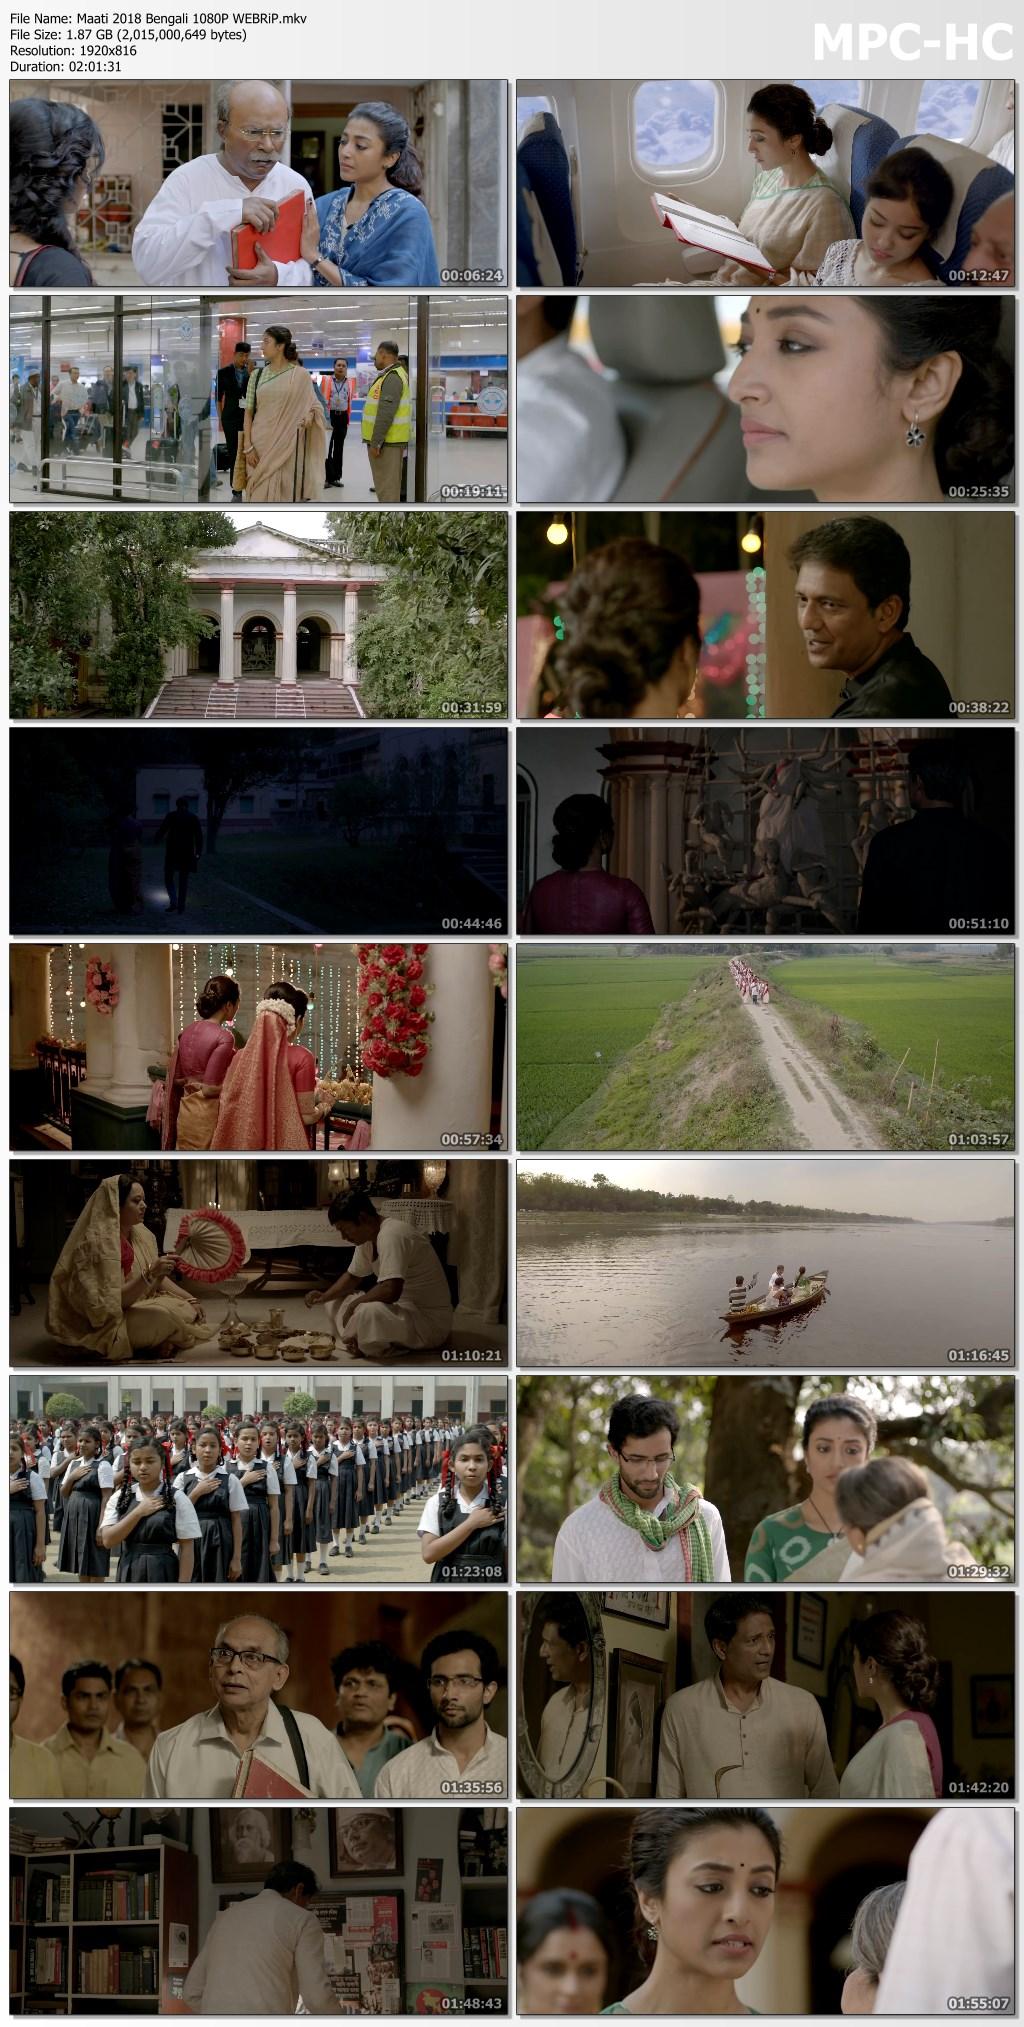 Maati 2018 Bengali 1080P WEBRiP.mkv thumbs